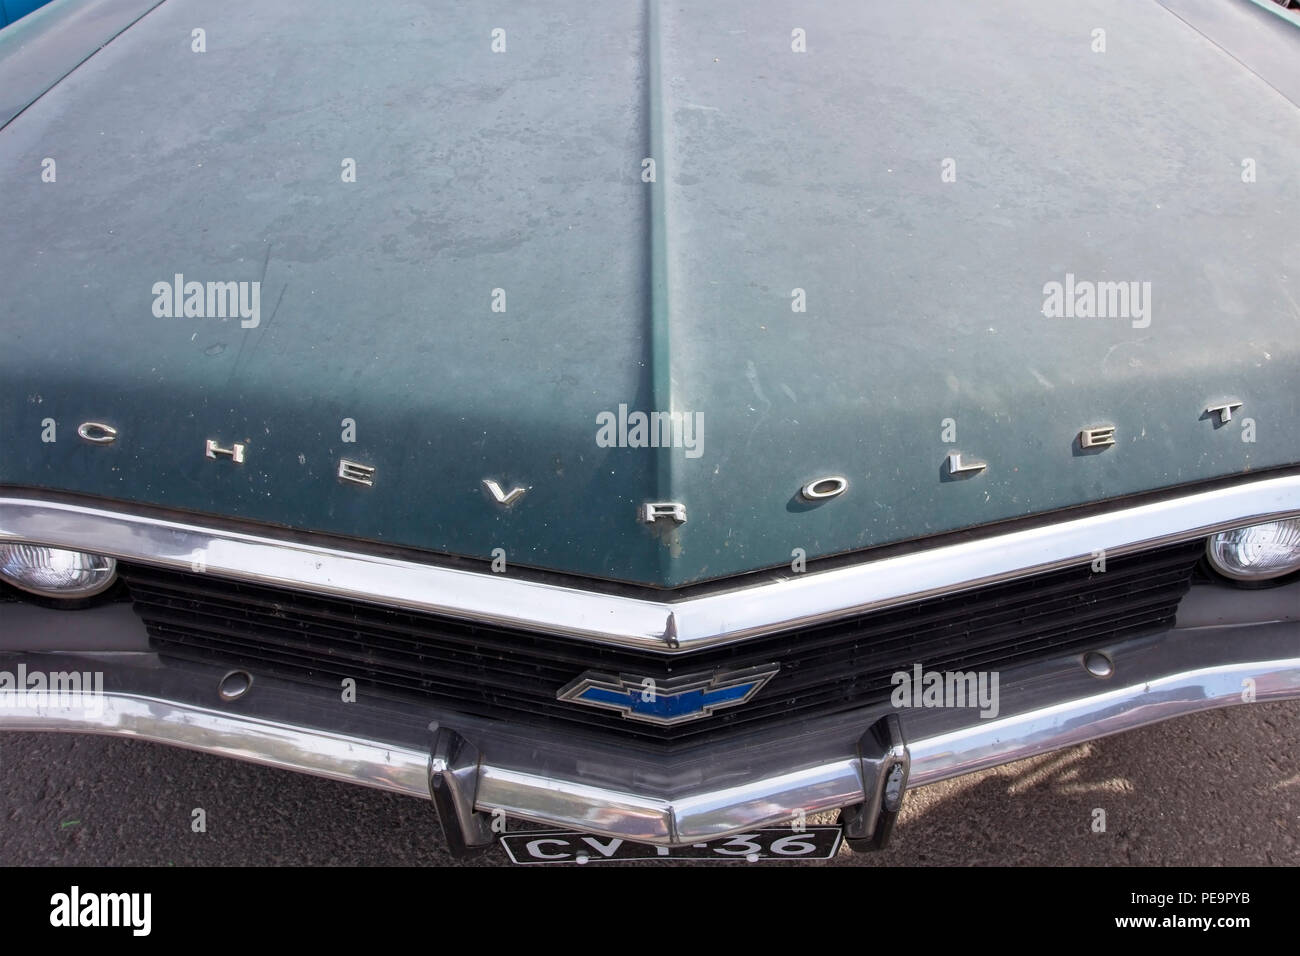 1960s Car Chevrolet Impala Stock Photos 1968 Custom Coupe Hood Detail Image